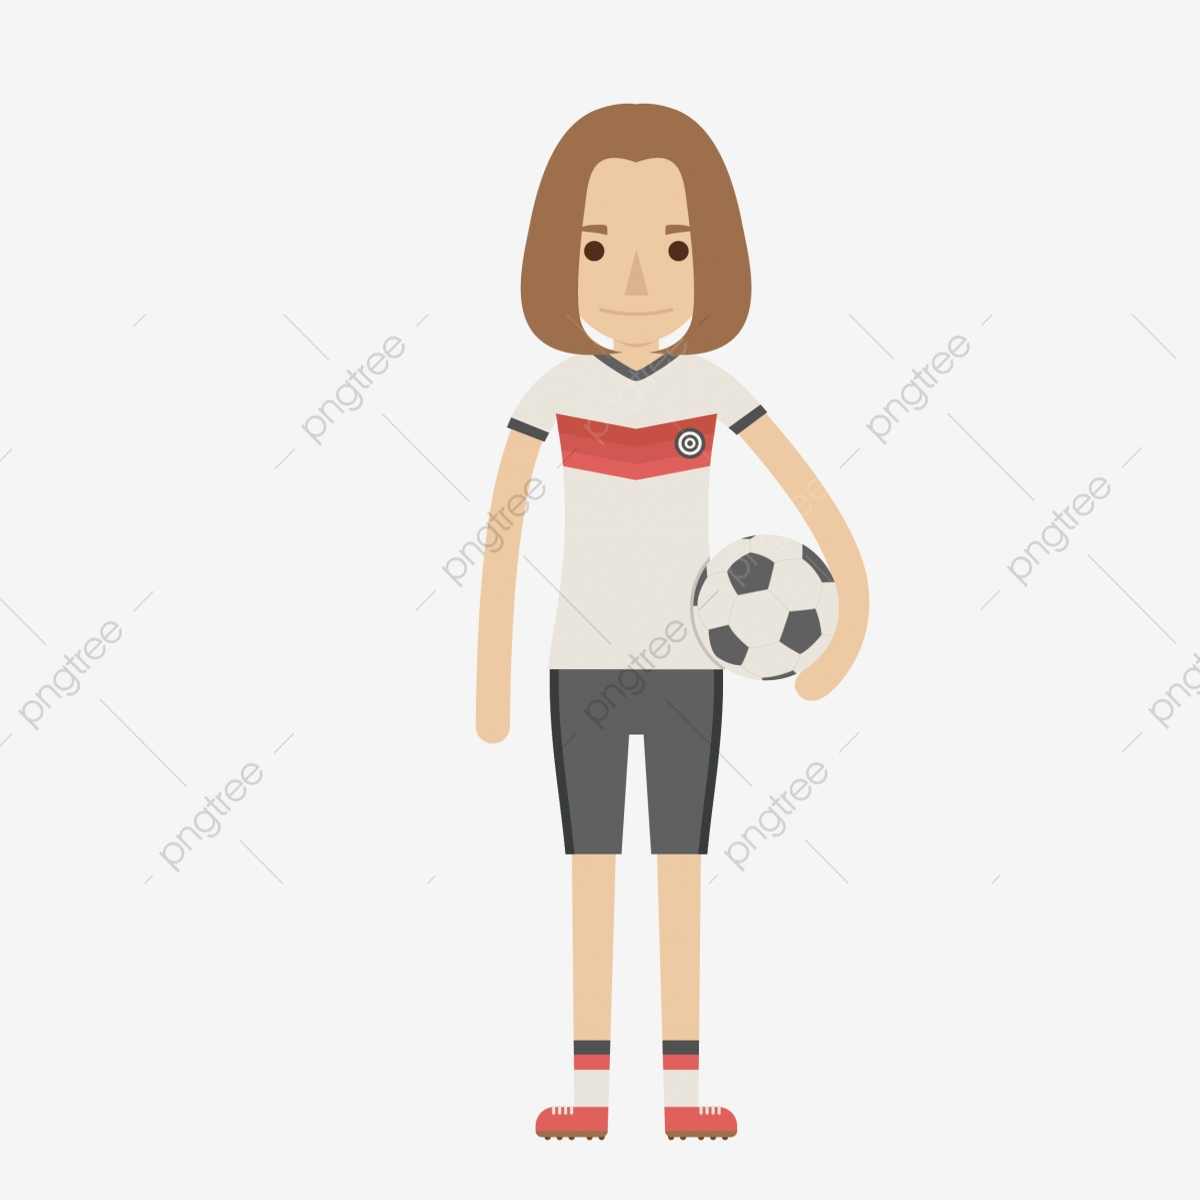 Get Soccer Player Cartoon Pics